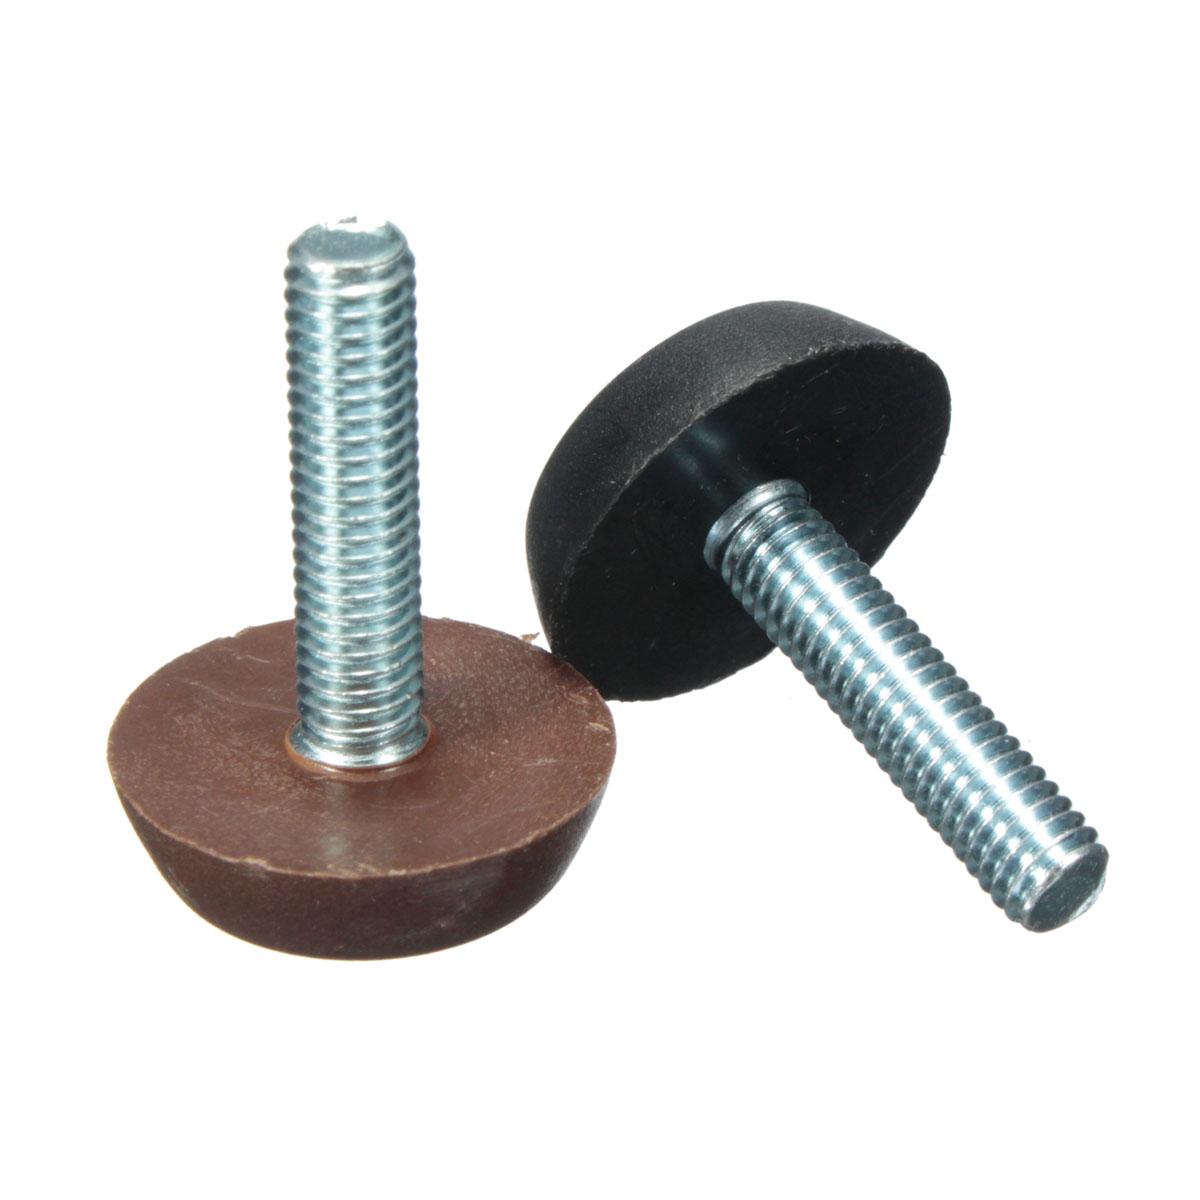 M adjustable screw threaded glide feet leveling foot